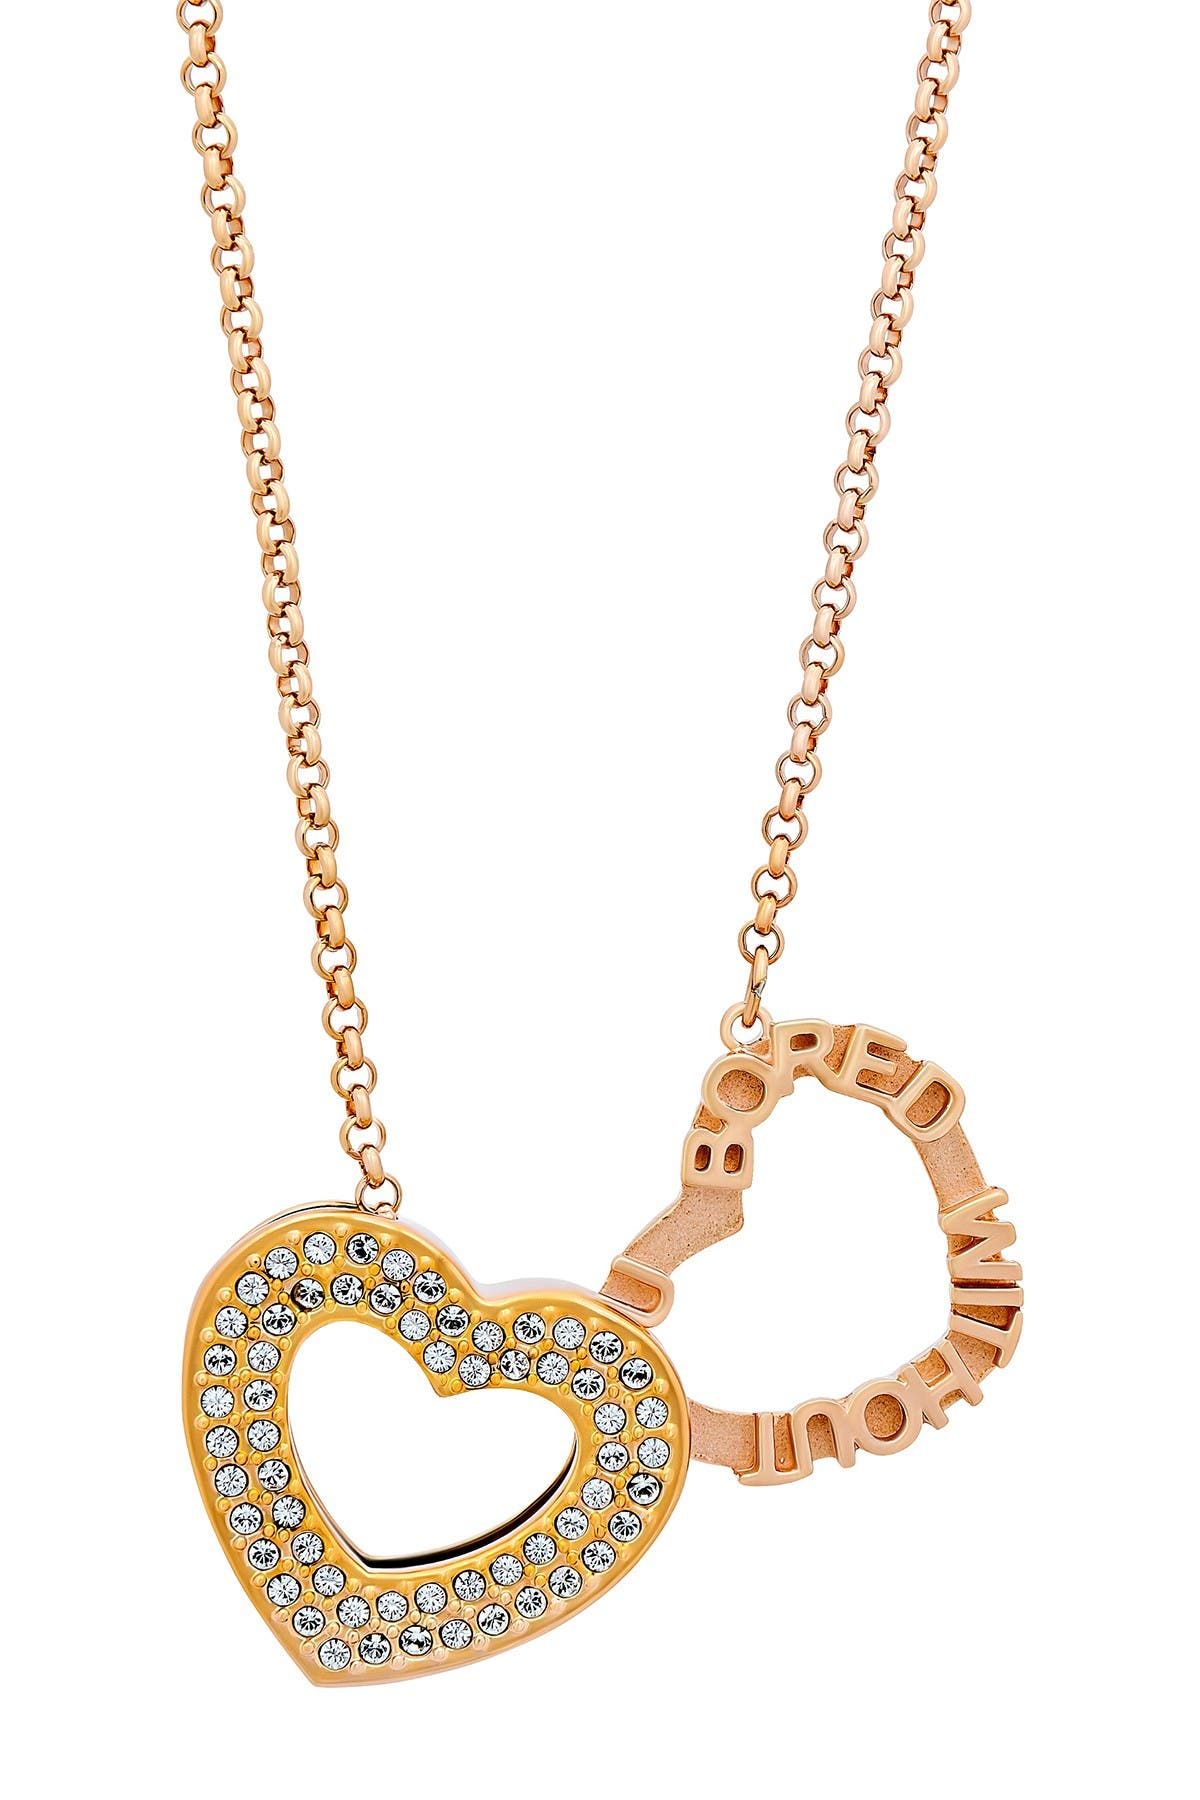 Image of Swarovski 18K Rose Gold Admiration Necklace